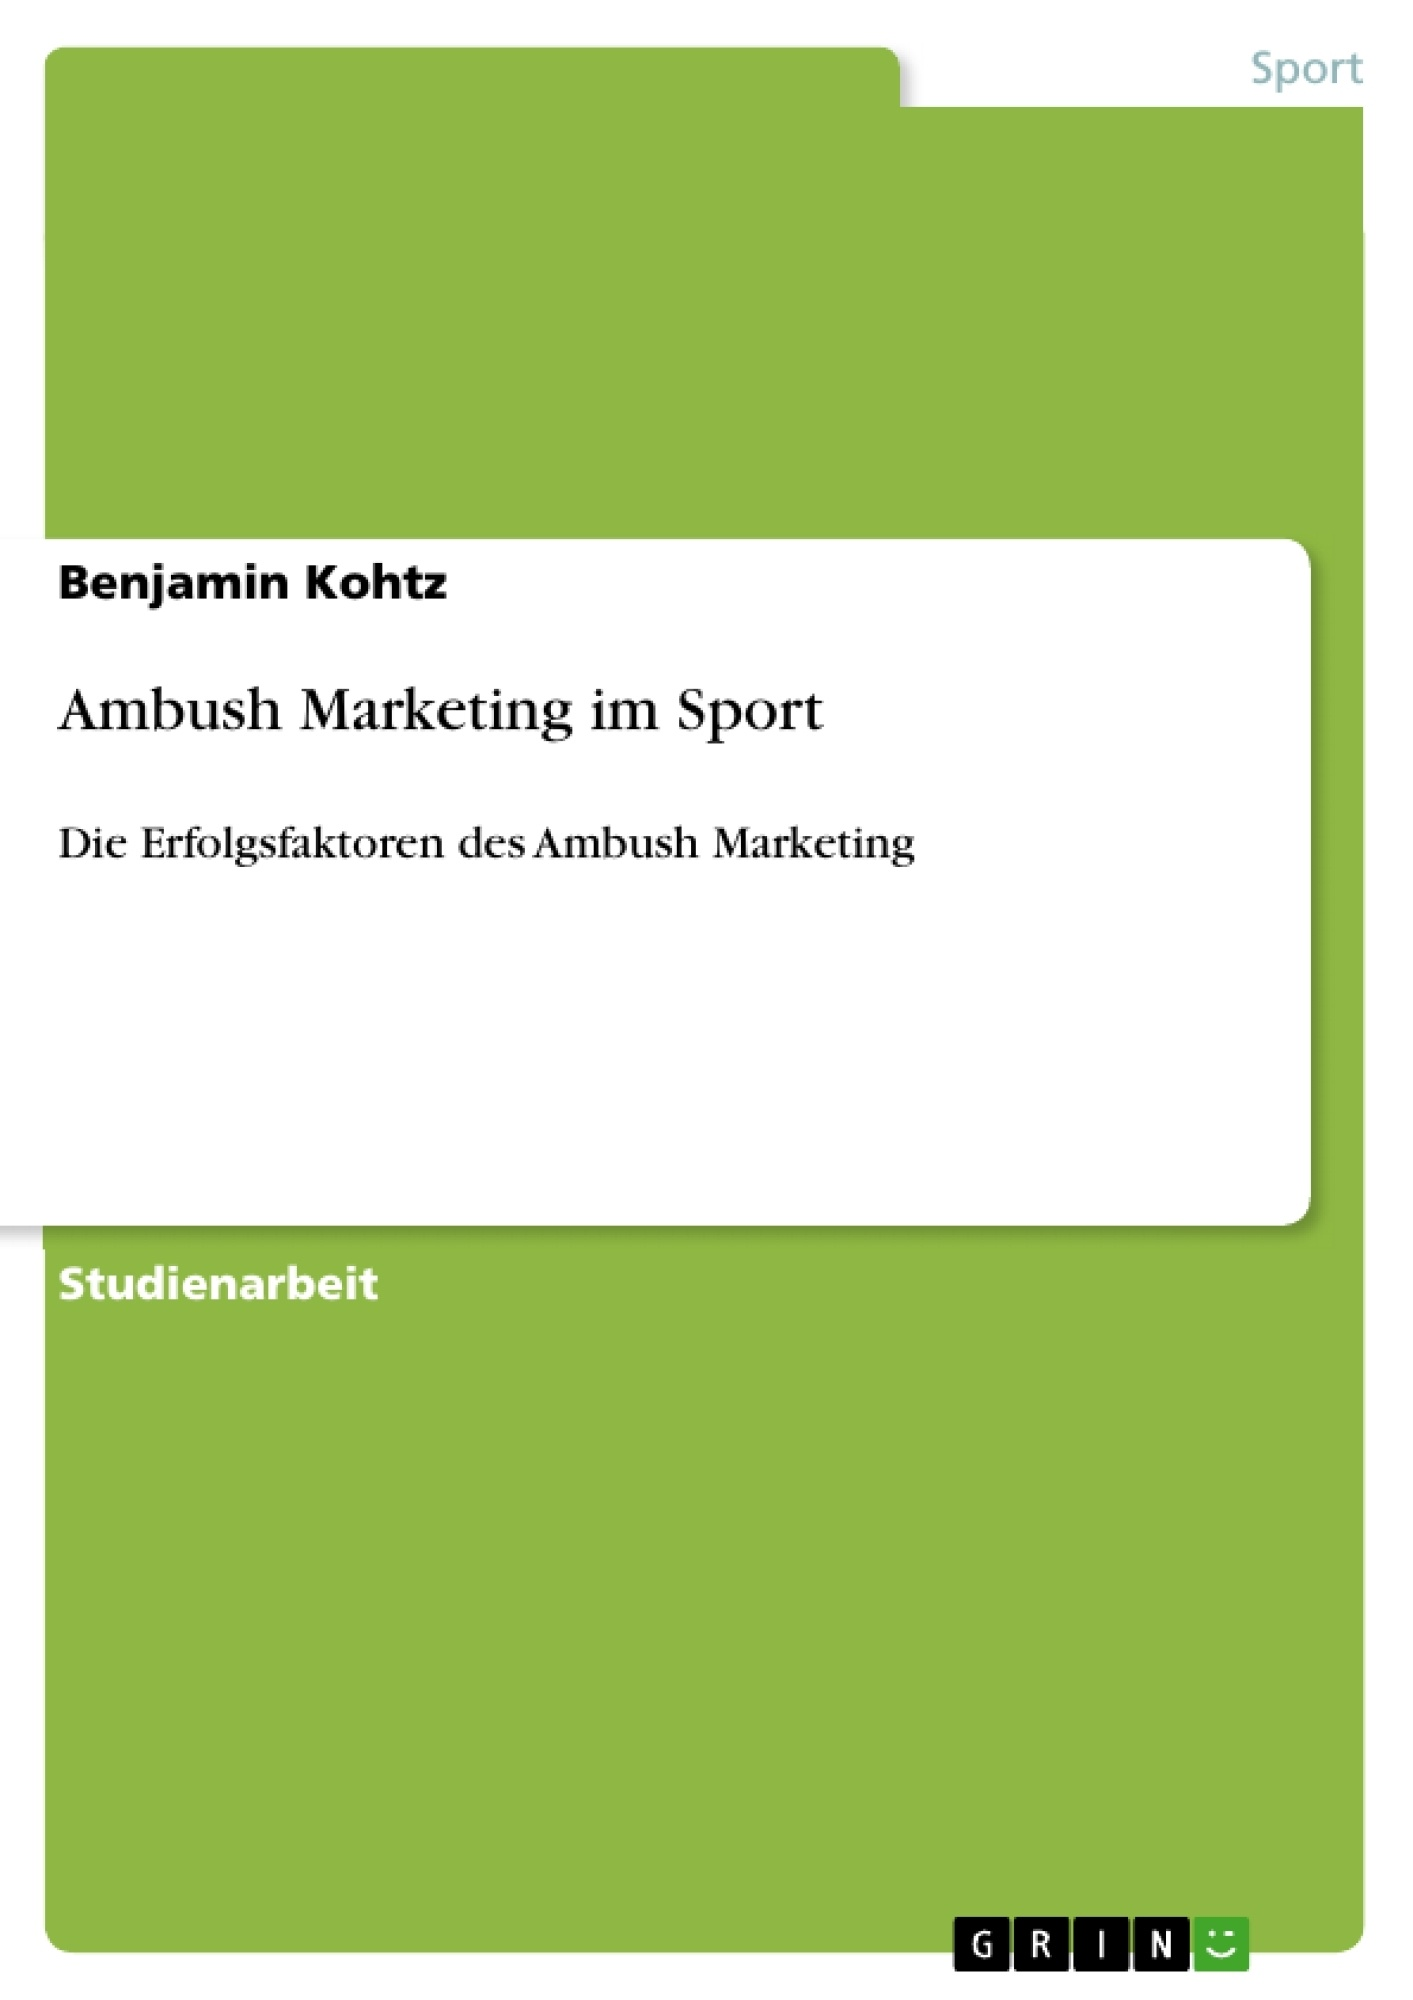 Titel: Ambush Marketing im Sport